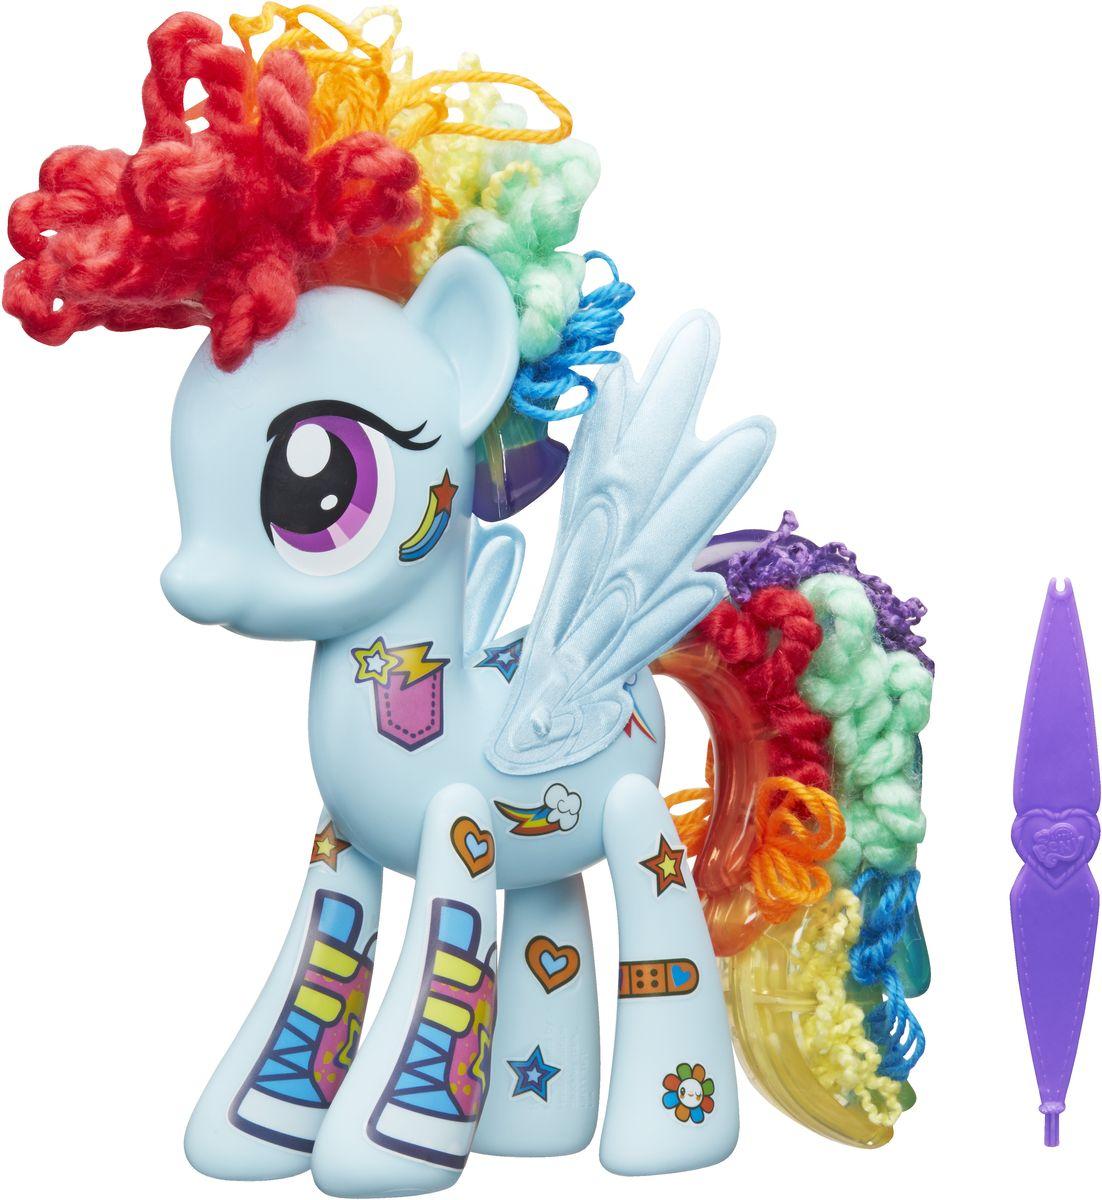 My Little Pony Игровой набор Design-a-Pony Rainbow Dash хасбро hаsbro b3604 b8074 my little pony игровой мейнхеттен rainbow dash